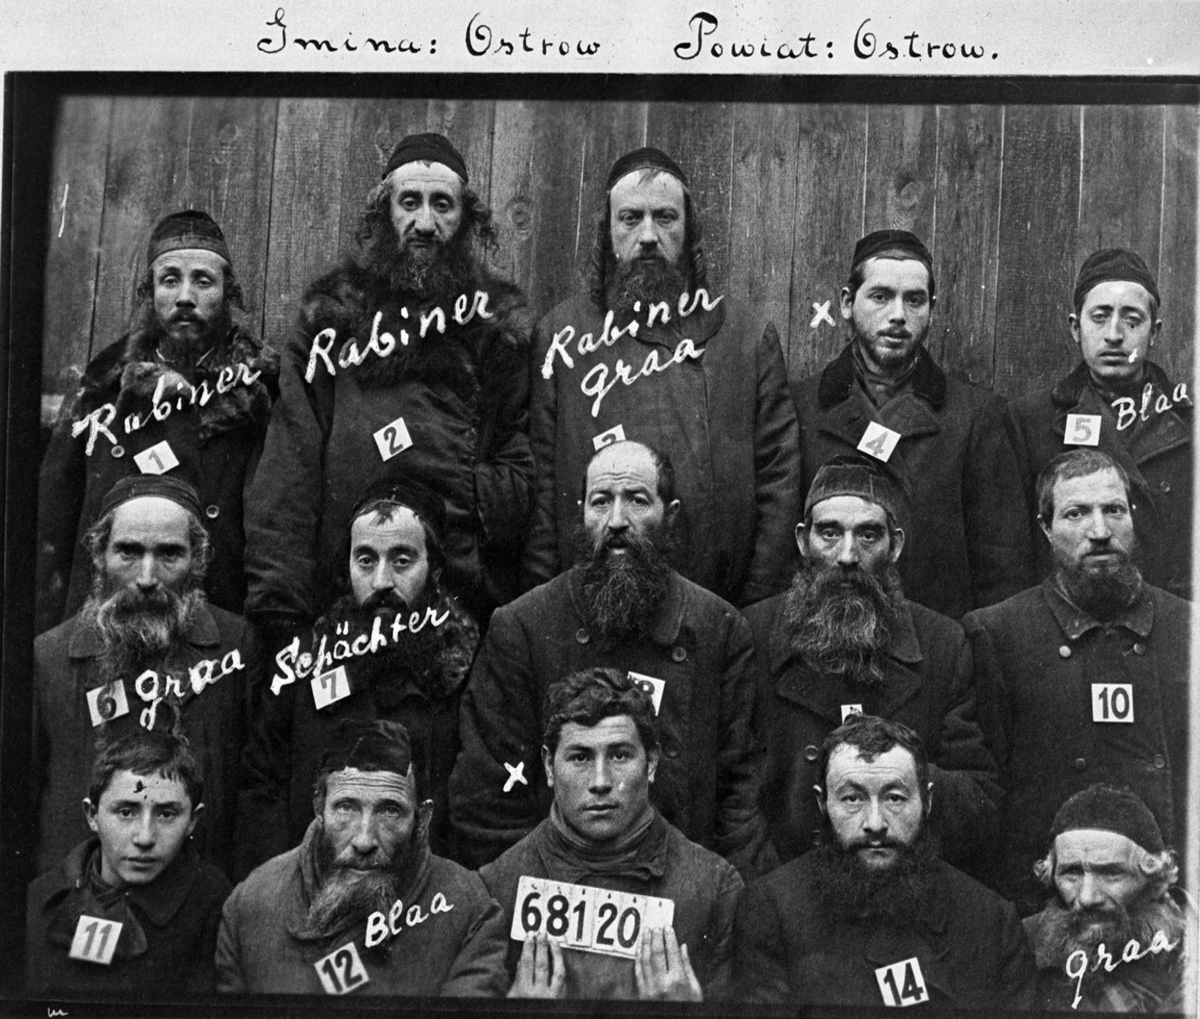 Smina: Ostrow Powiat: Ostrow (jøder - rabinere)